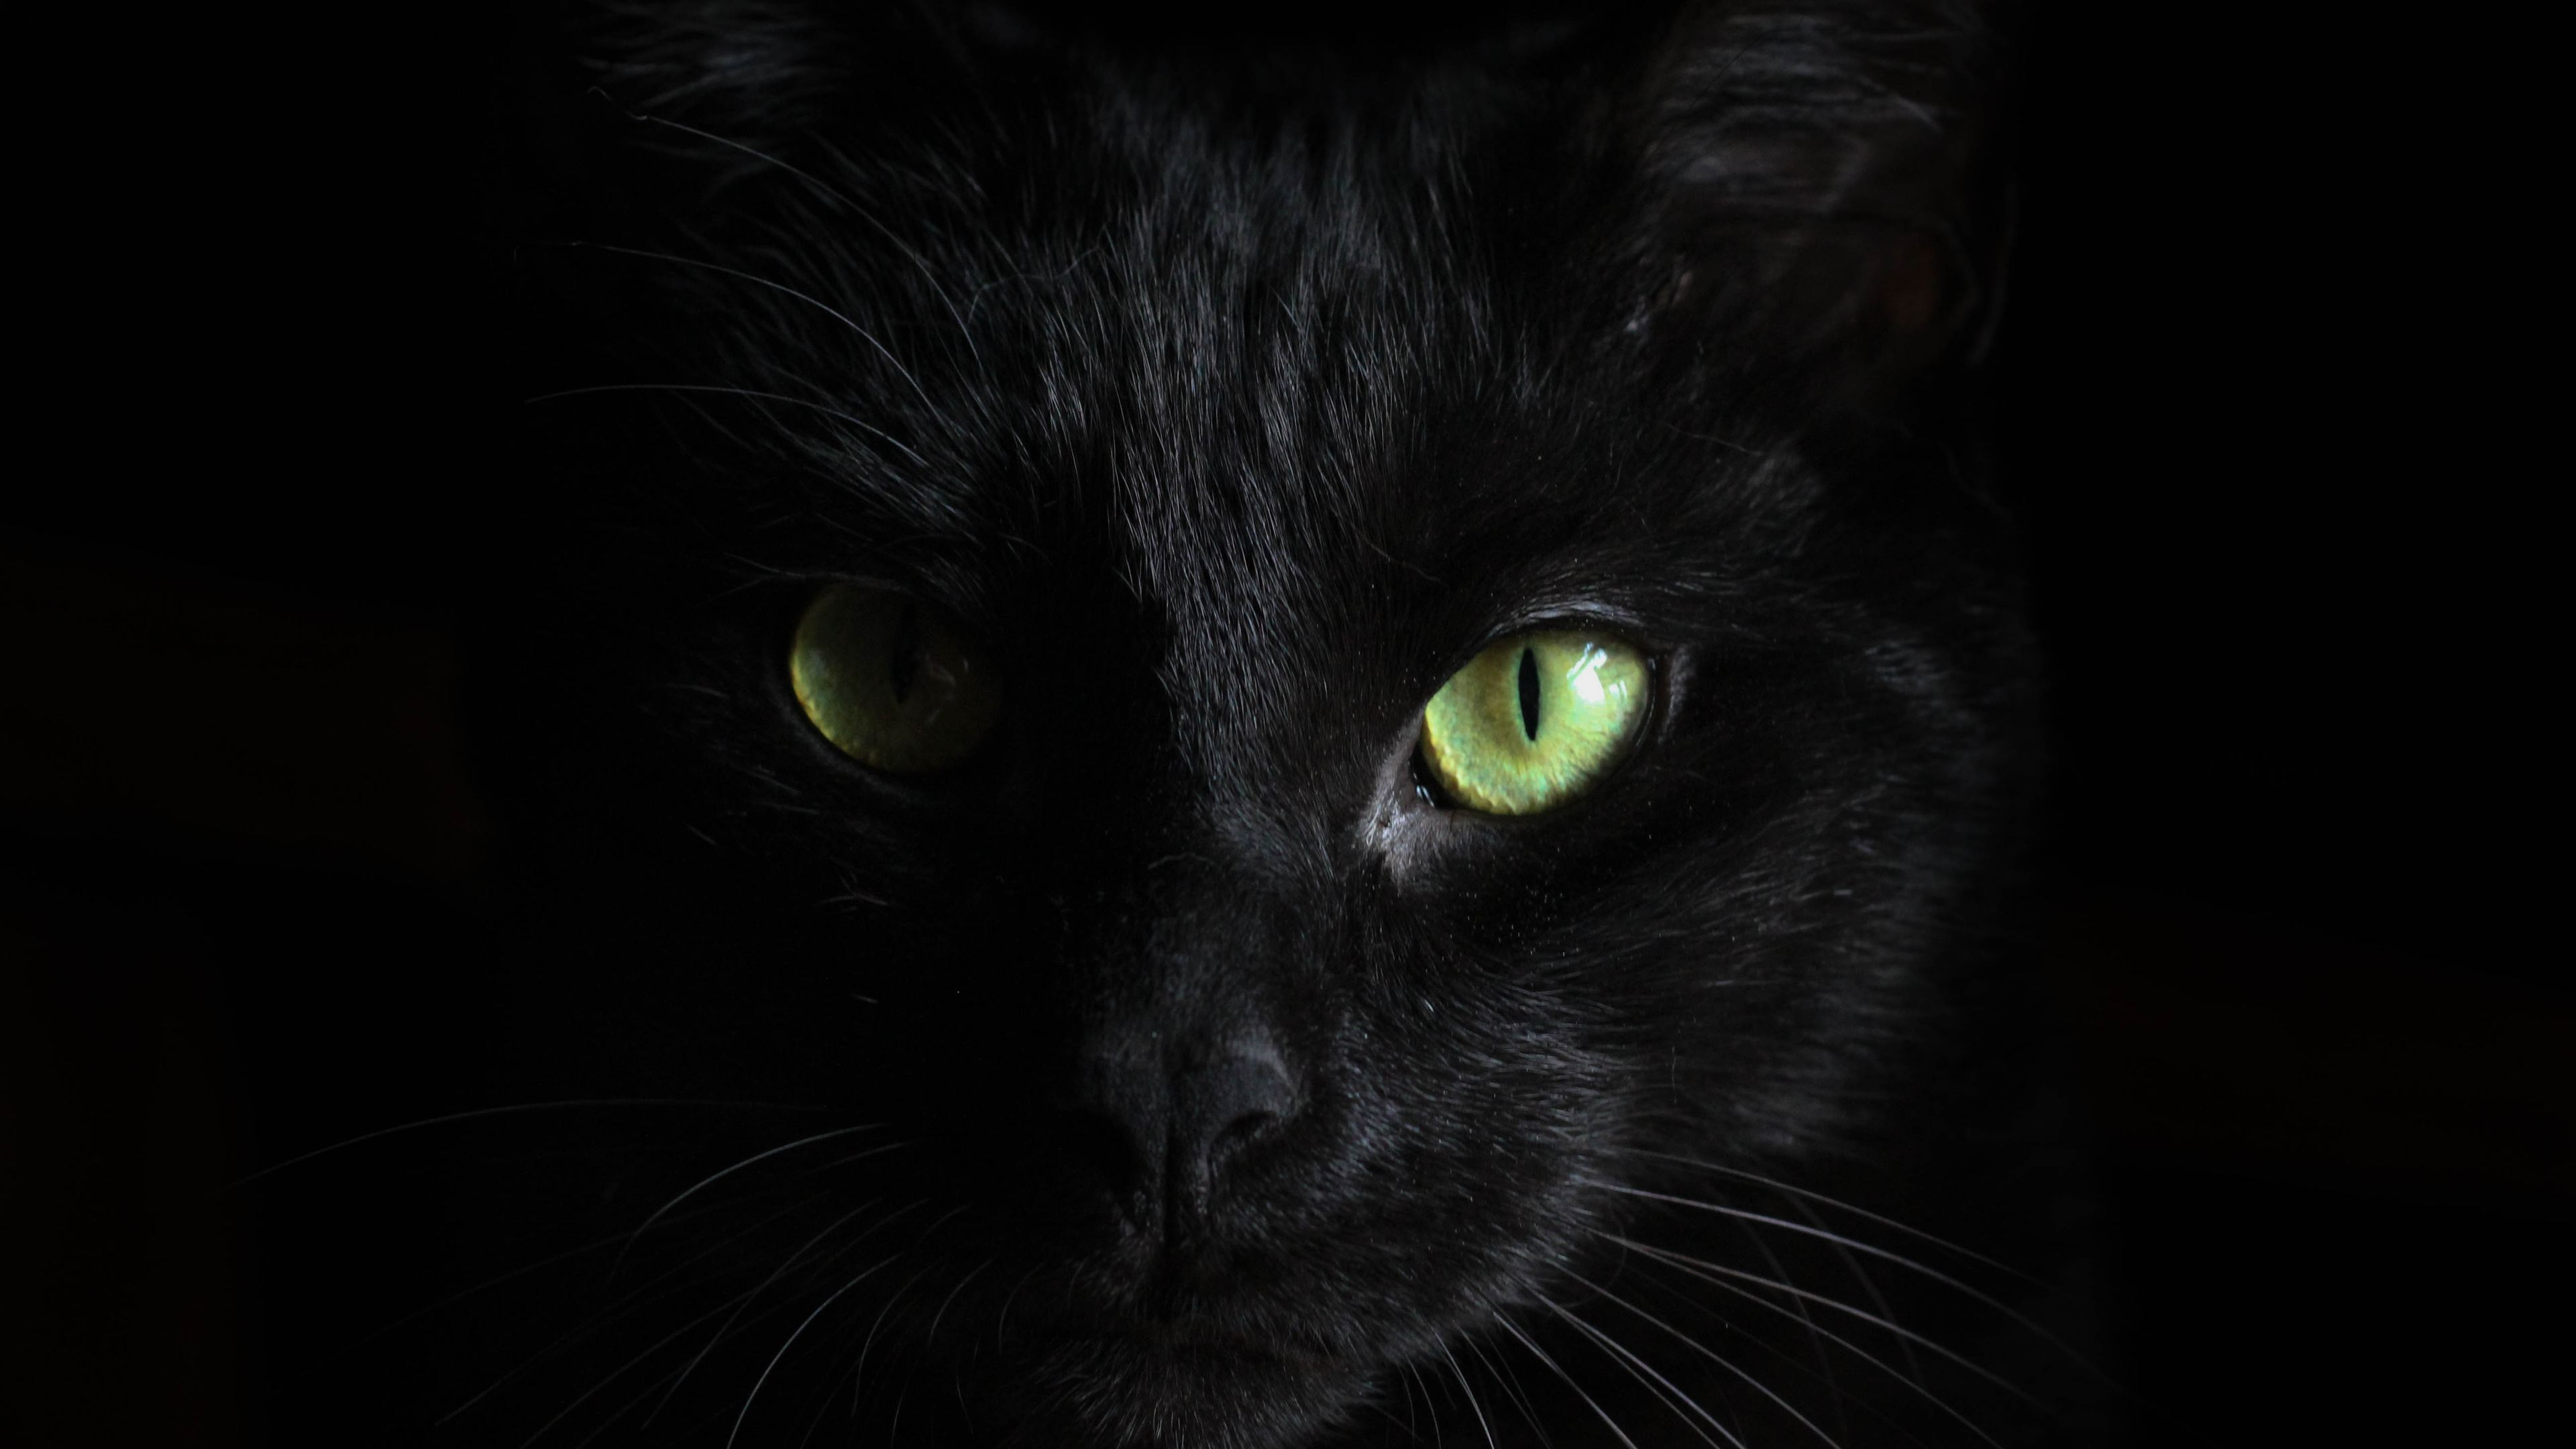 black cat green eyes 1542239106 - Black Cat Green Eyes - hd-wallpapers, dark wallpapers, cat wallpapers, black wallpapers, animals wallpapers, 4k-wallpapers